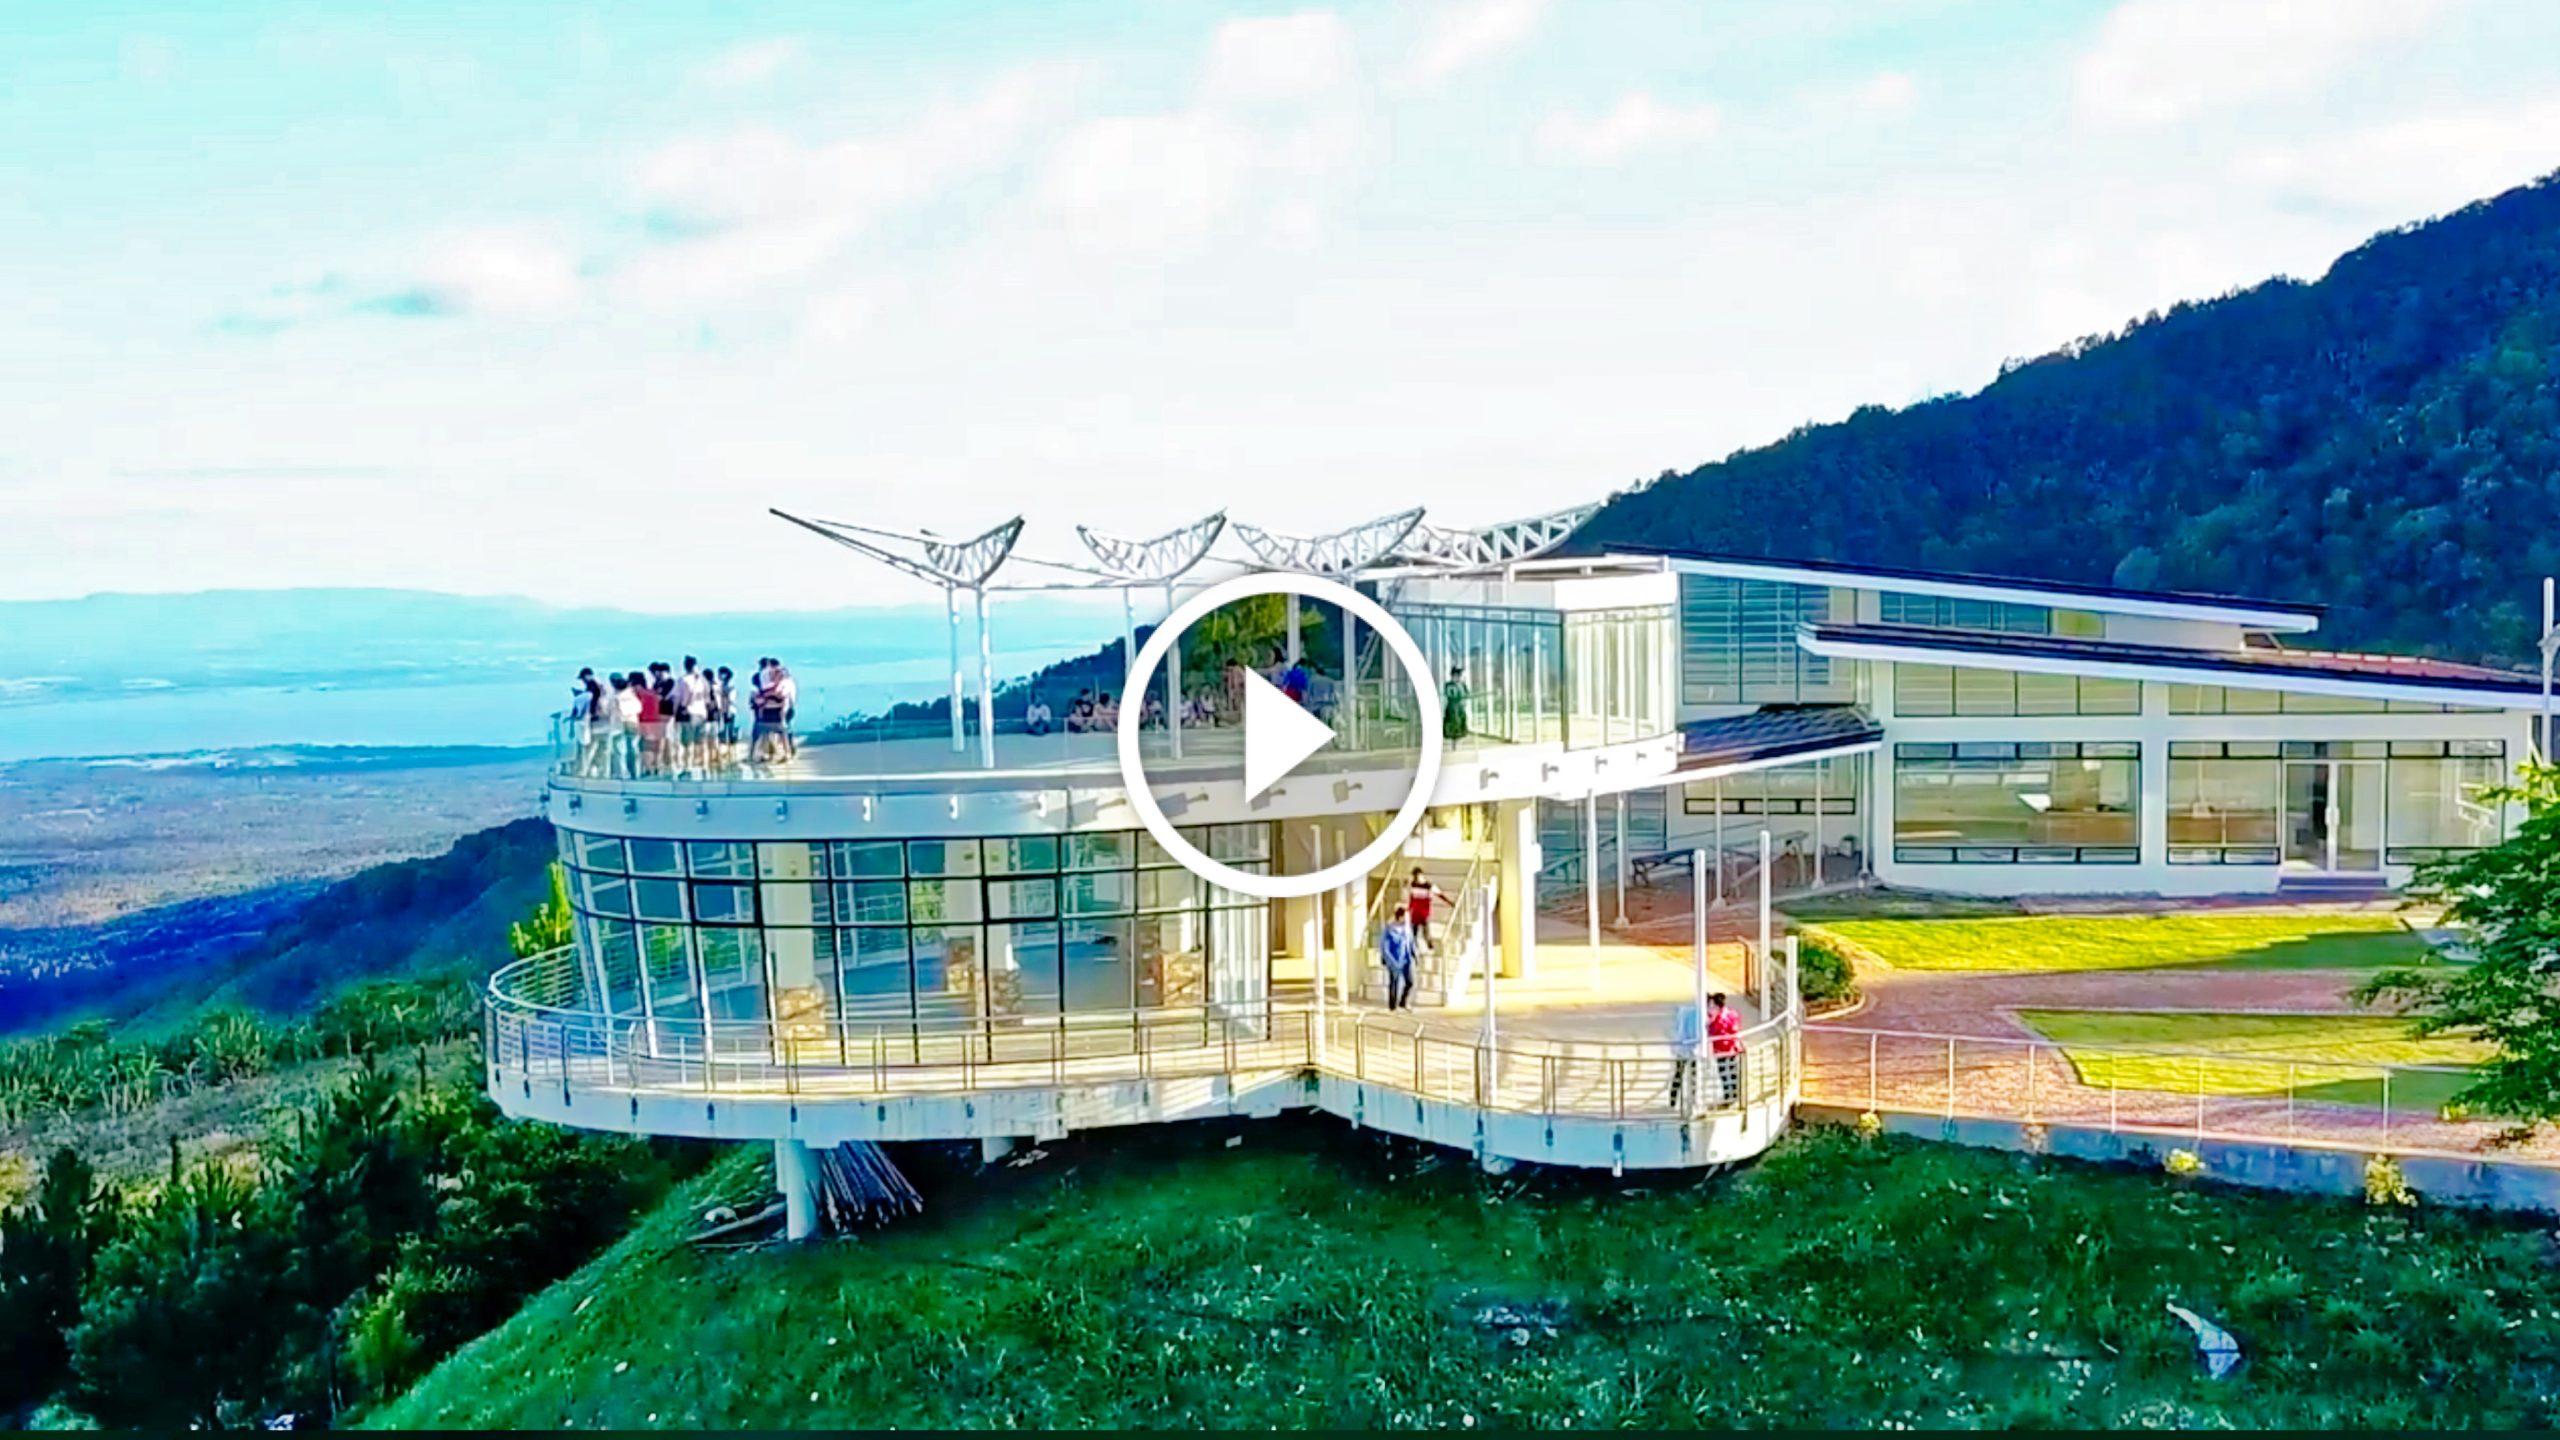 Spectacular Belvedere Hoyohoy View Deck in Tangub, Misamis